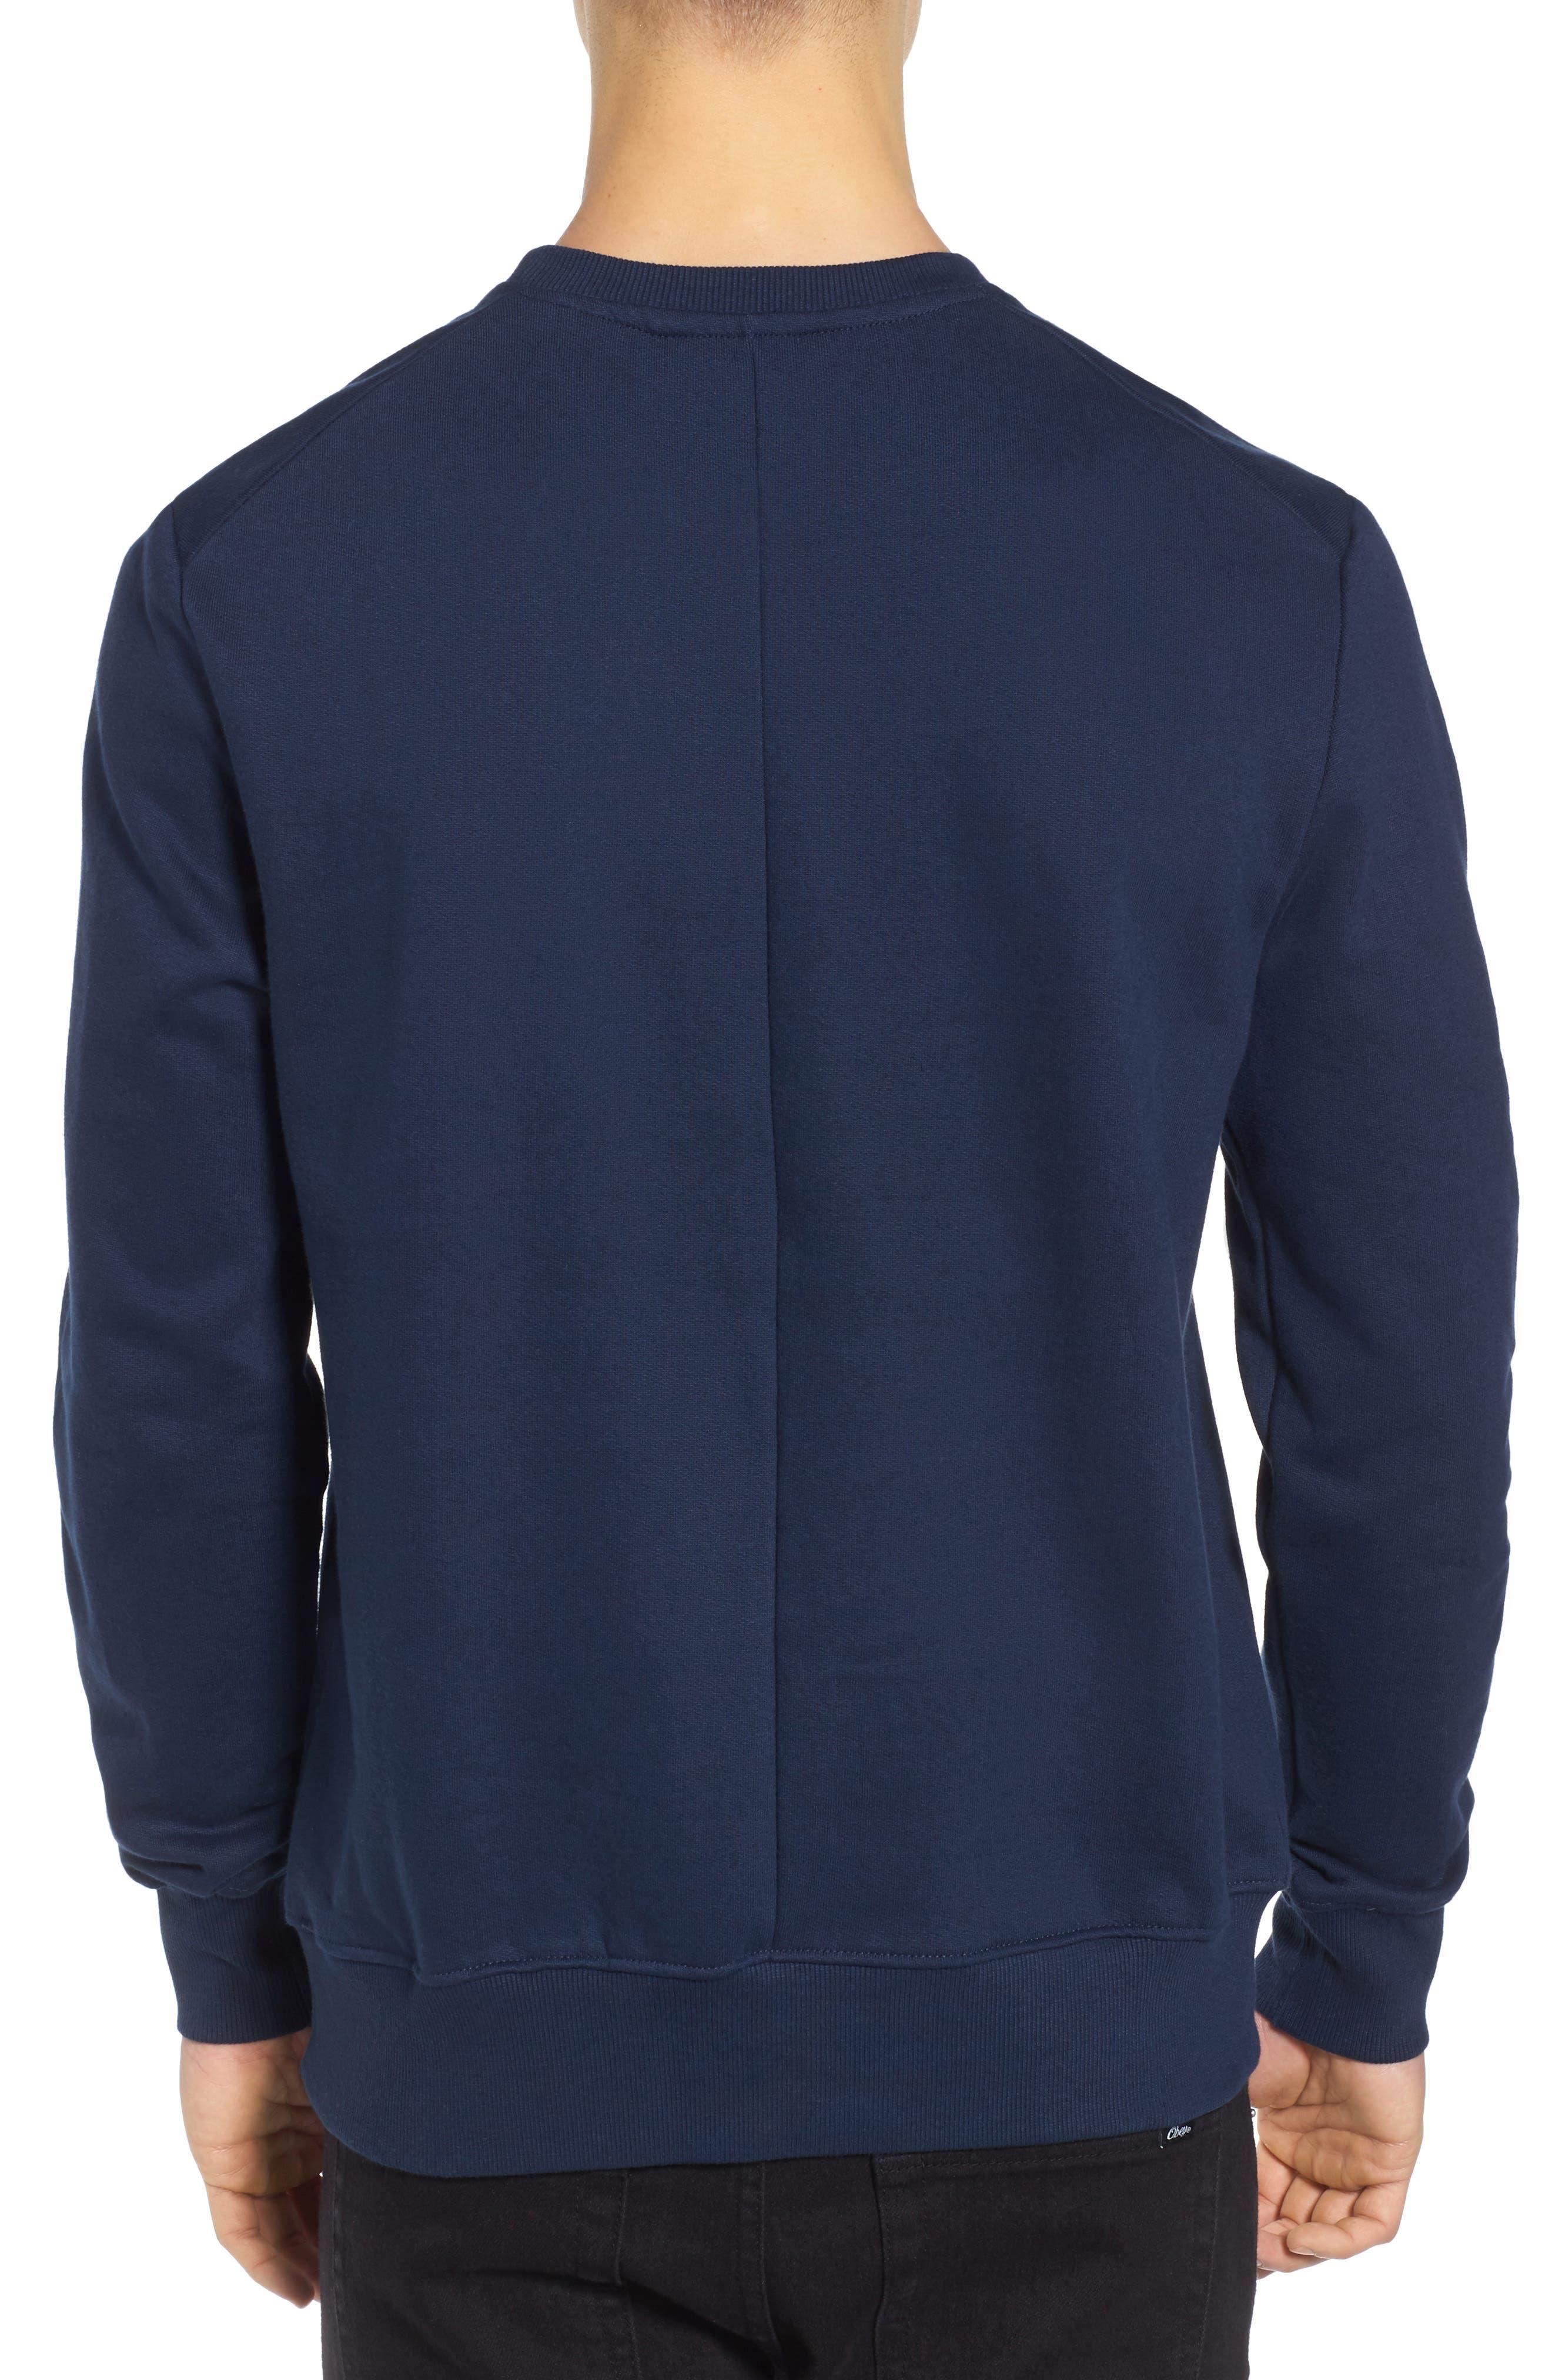 Alternate Image 2  - ELEVENPARIS Nokat Appliqué Sweatshirt